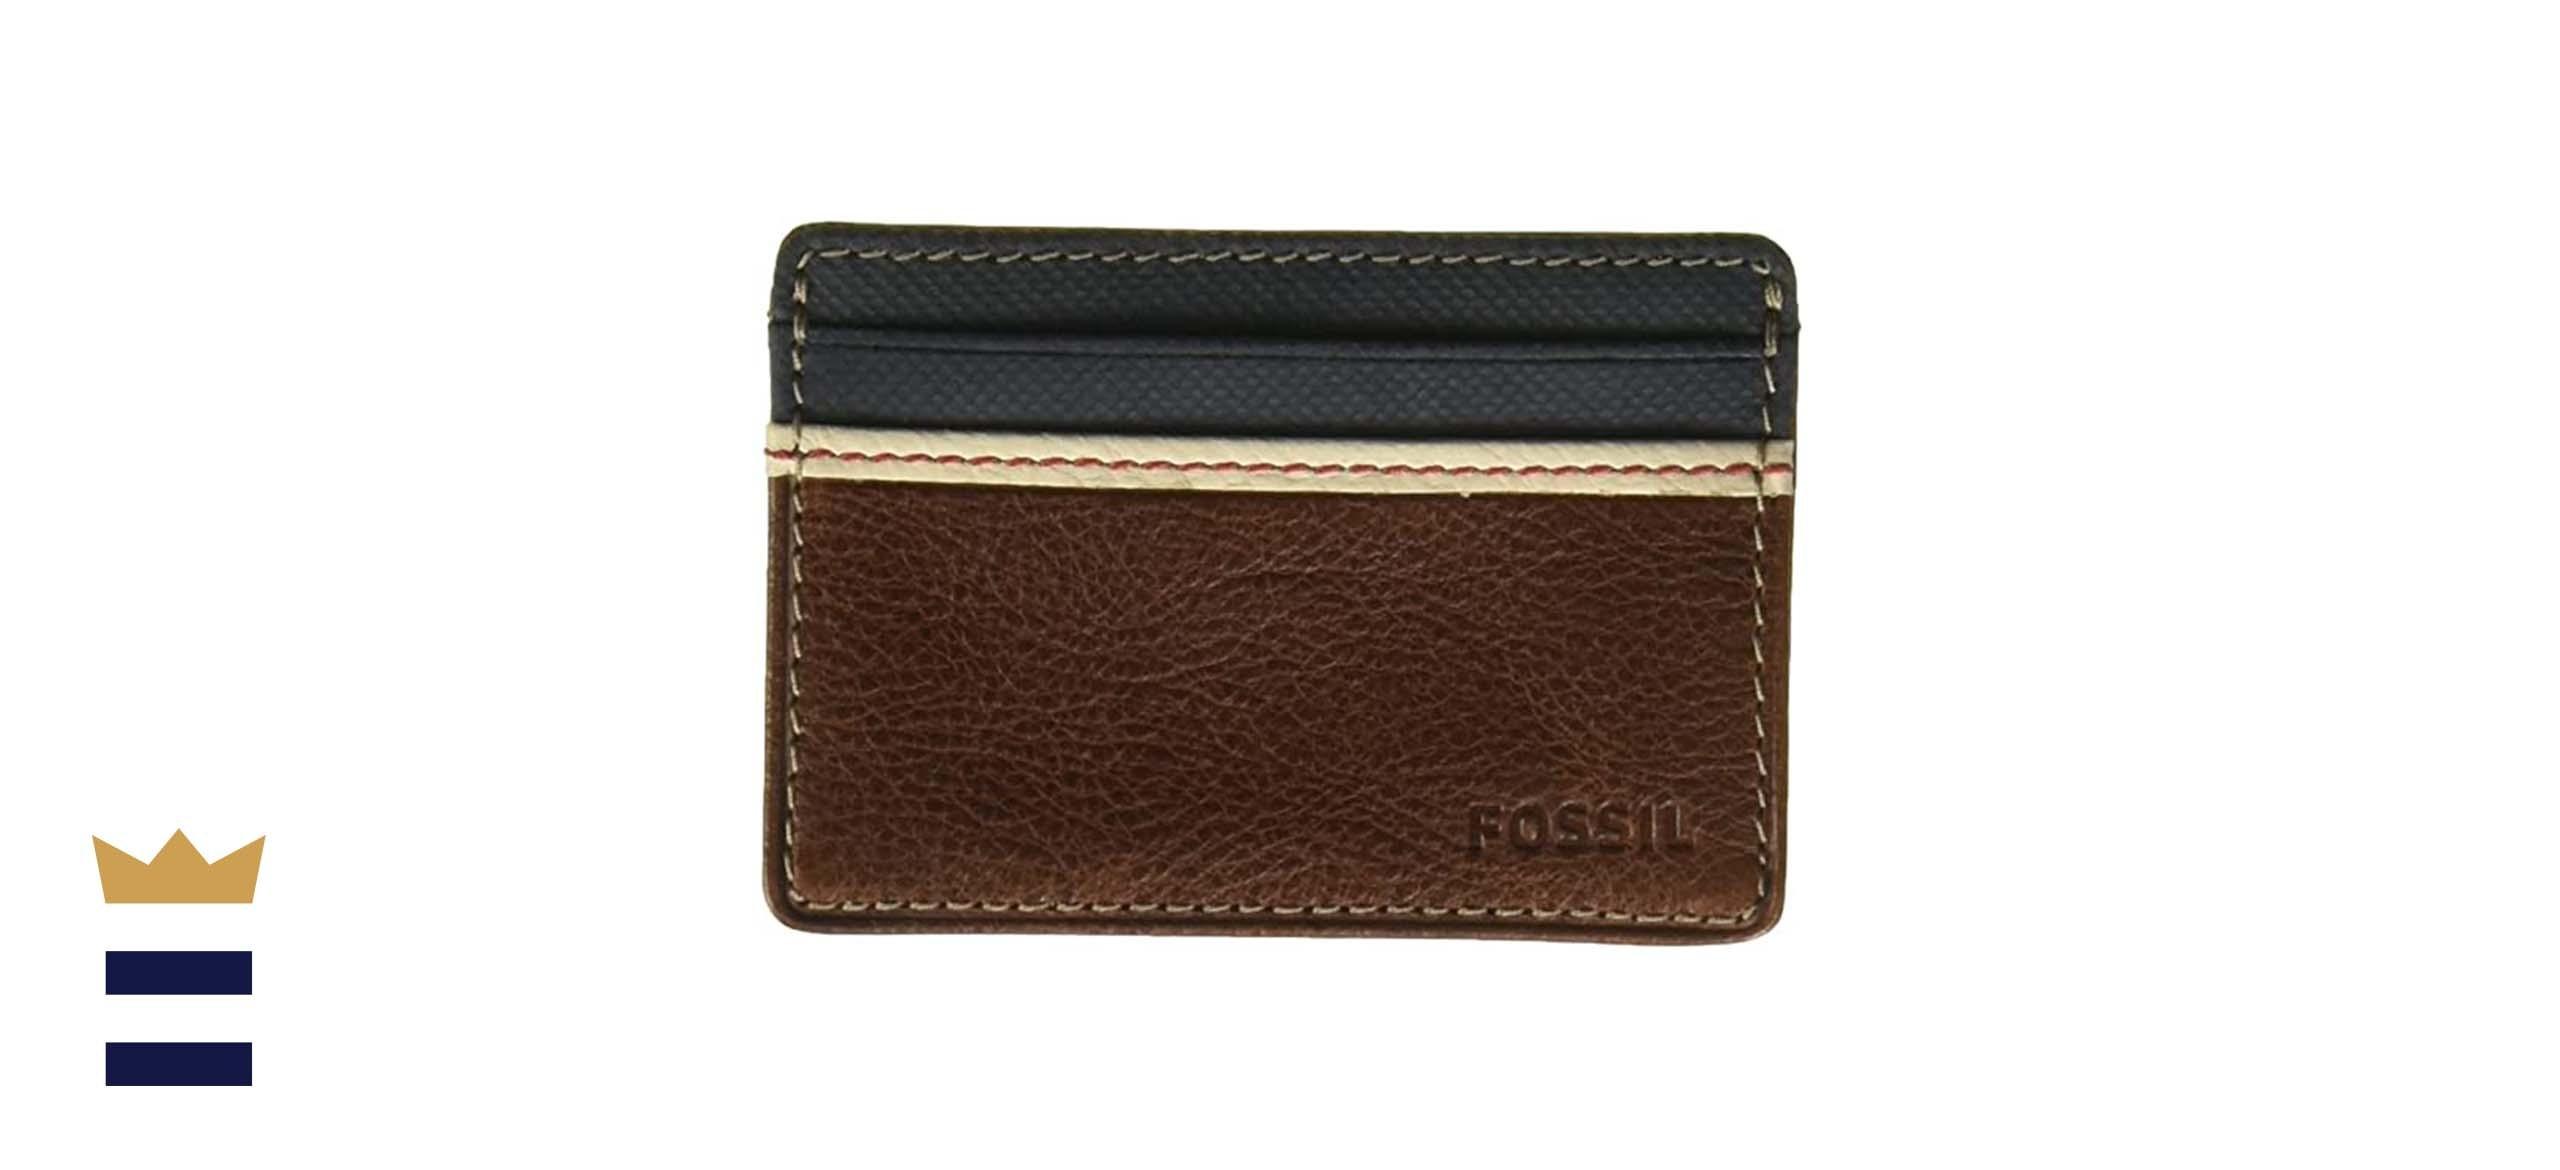 Fossil Men's Leather Minimalist Card Case Front Pocket Wallet